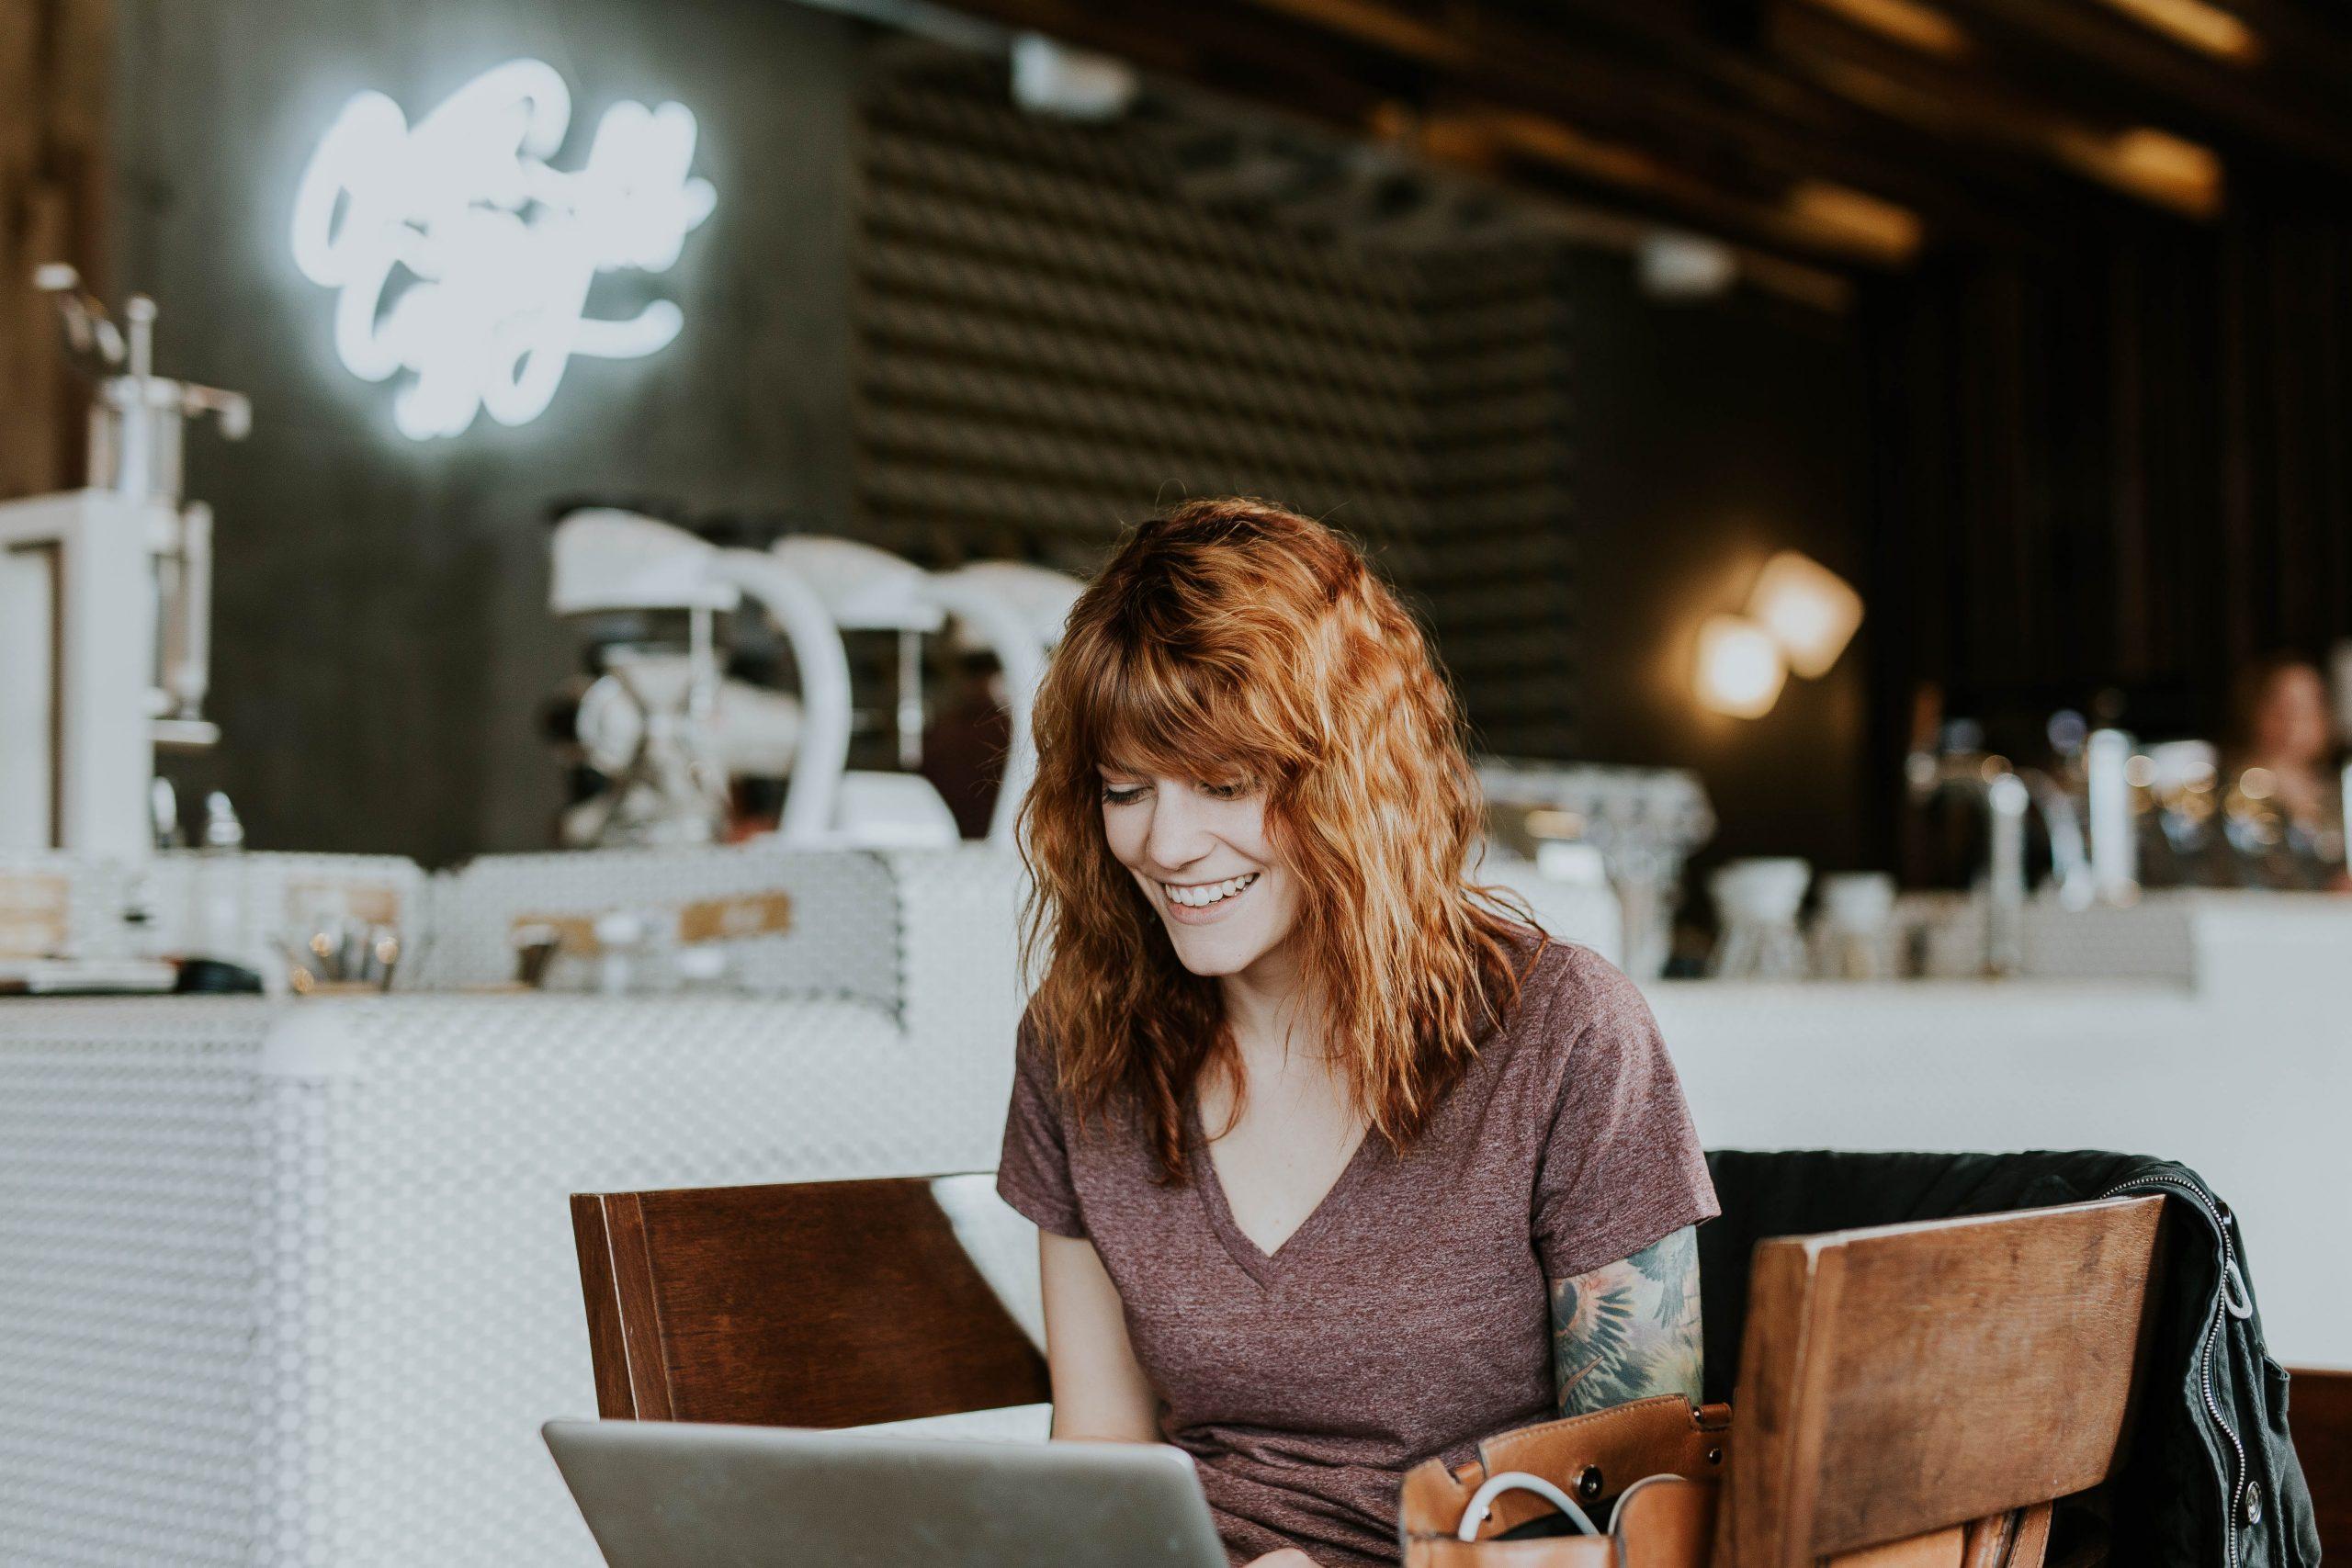 How to Find Online Tutor Jobs